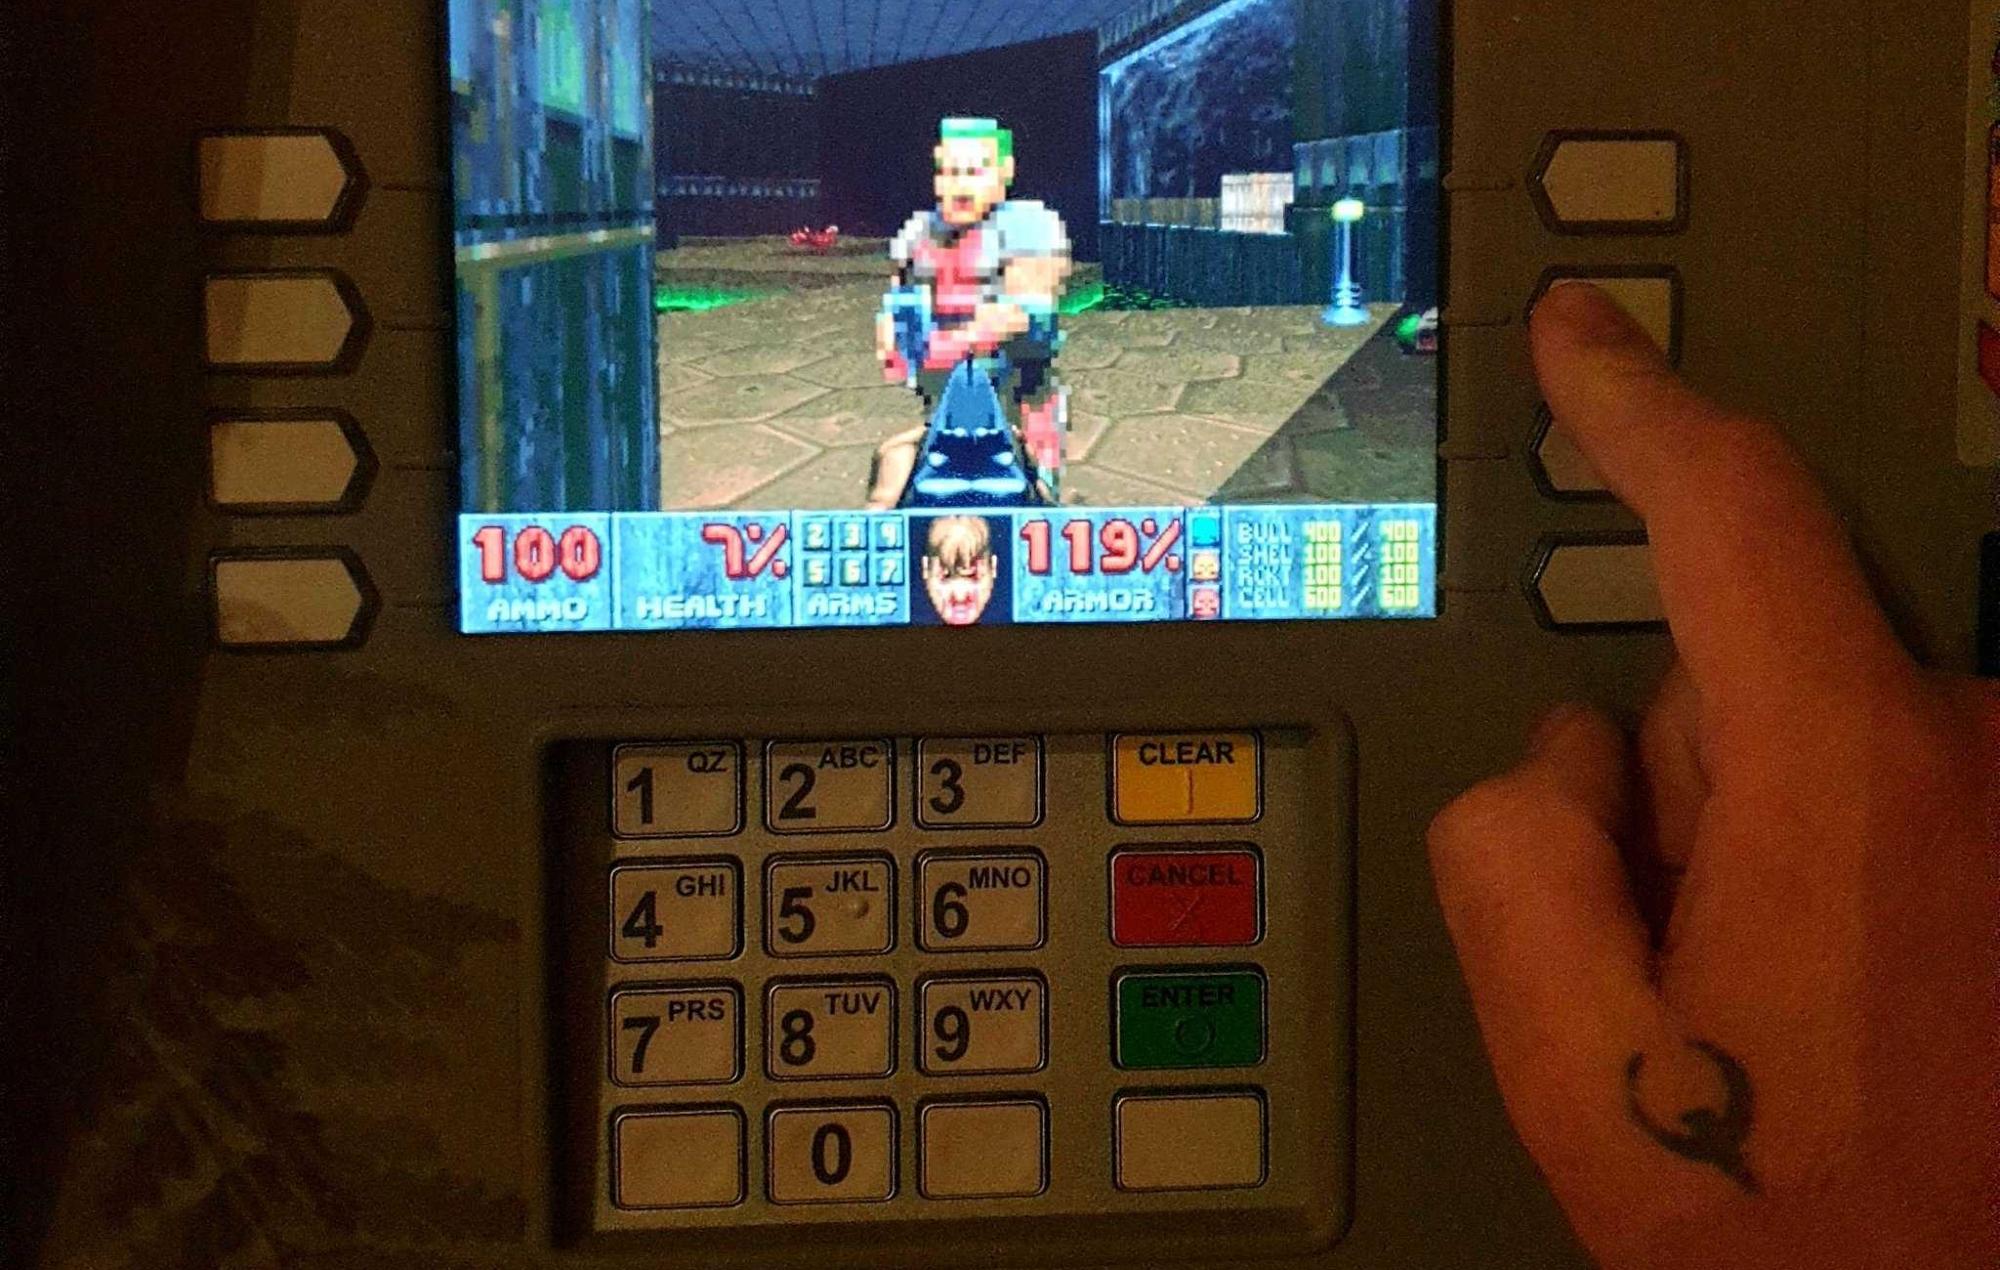 Doom on cash machine with quake tattoo